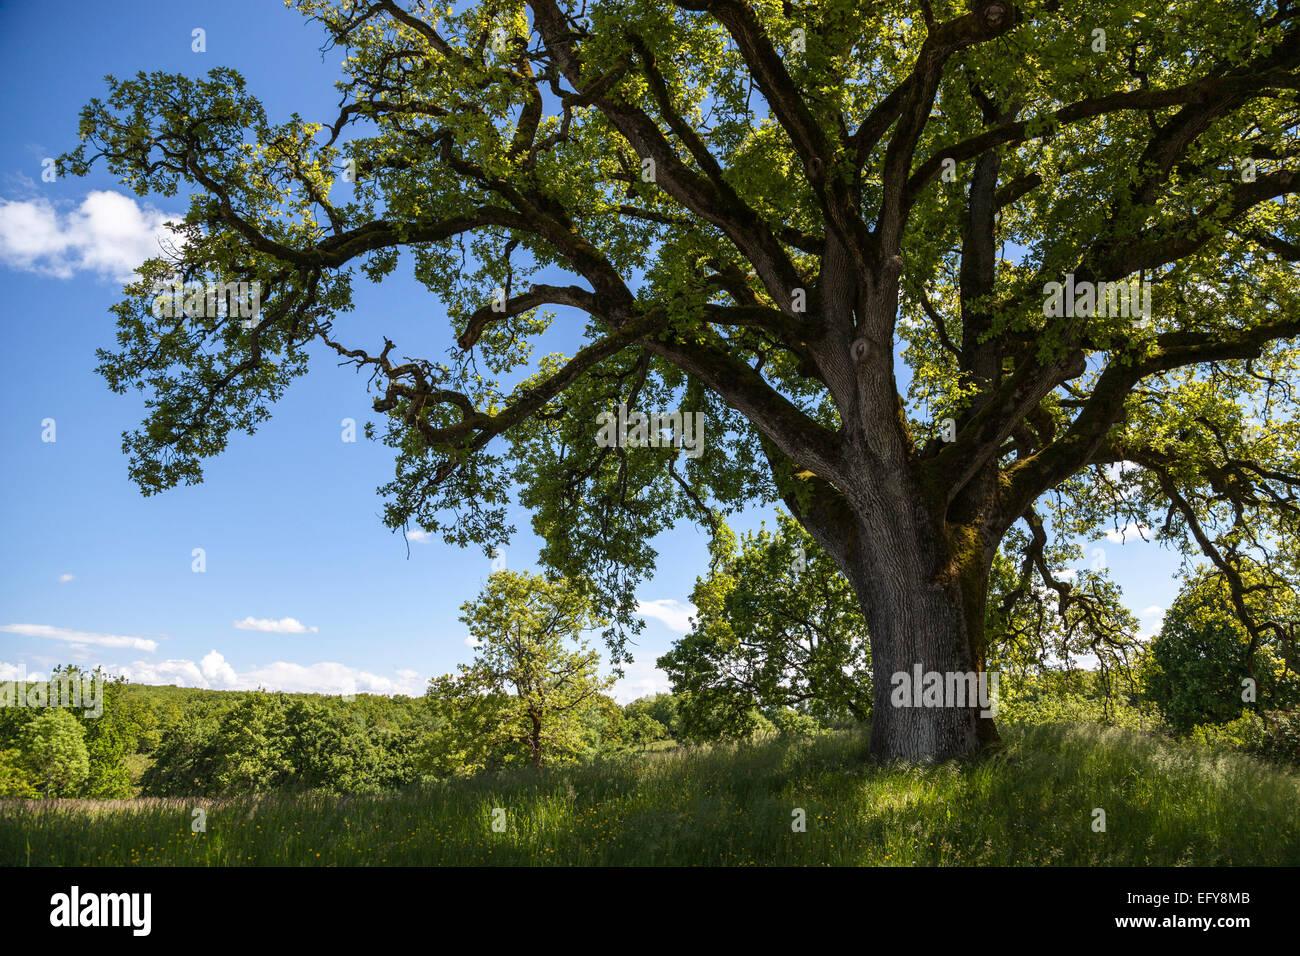 Ancient Quercus robur (Pedunculate oak) in a field - Stock Image